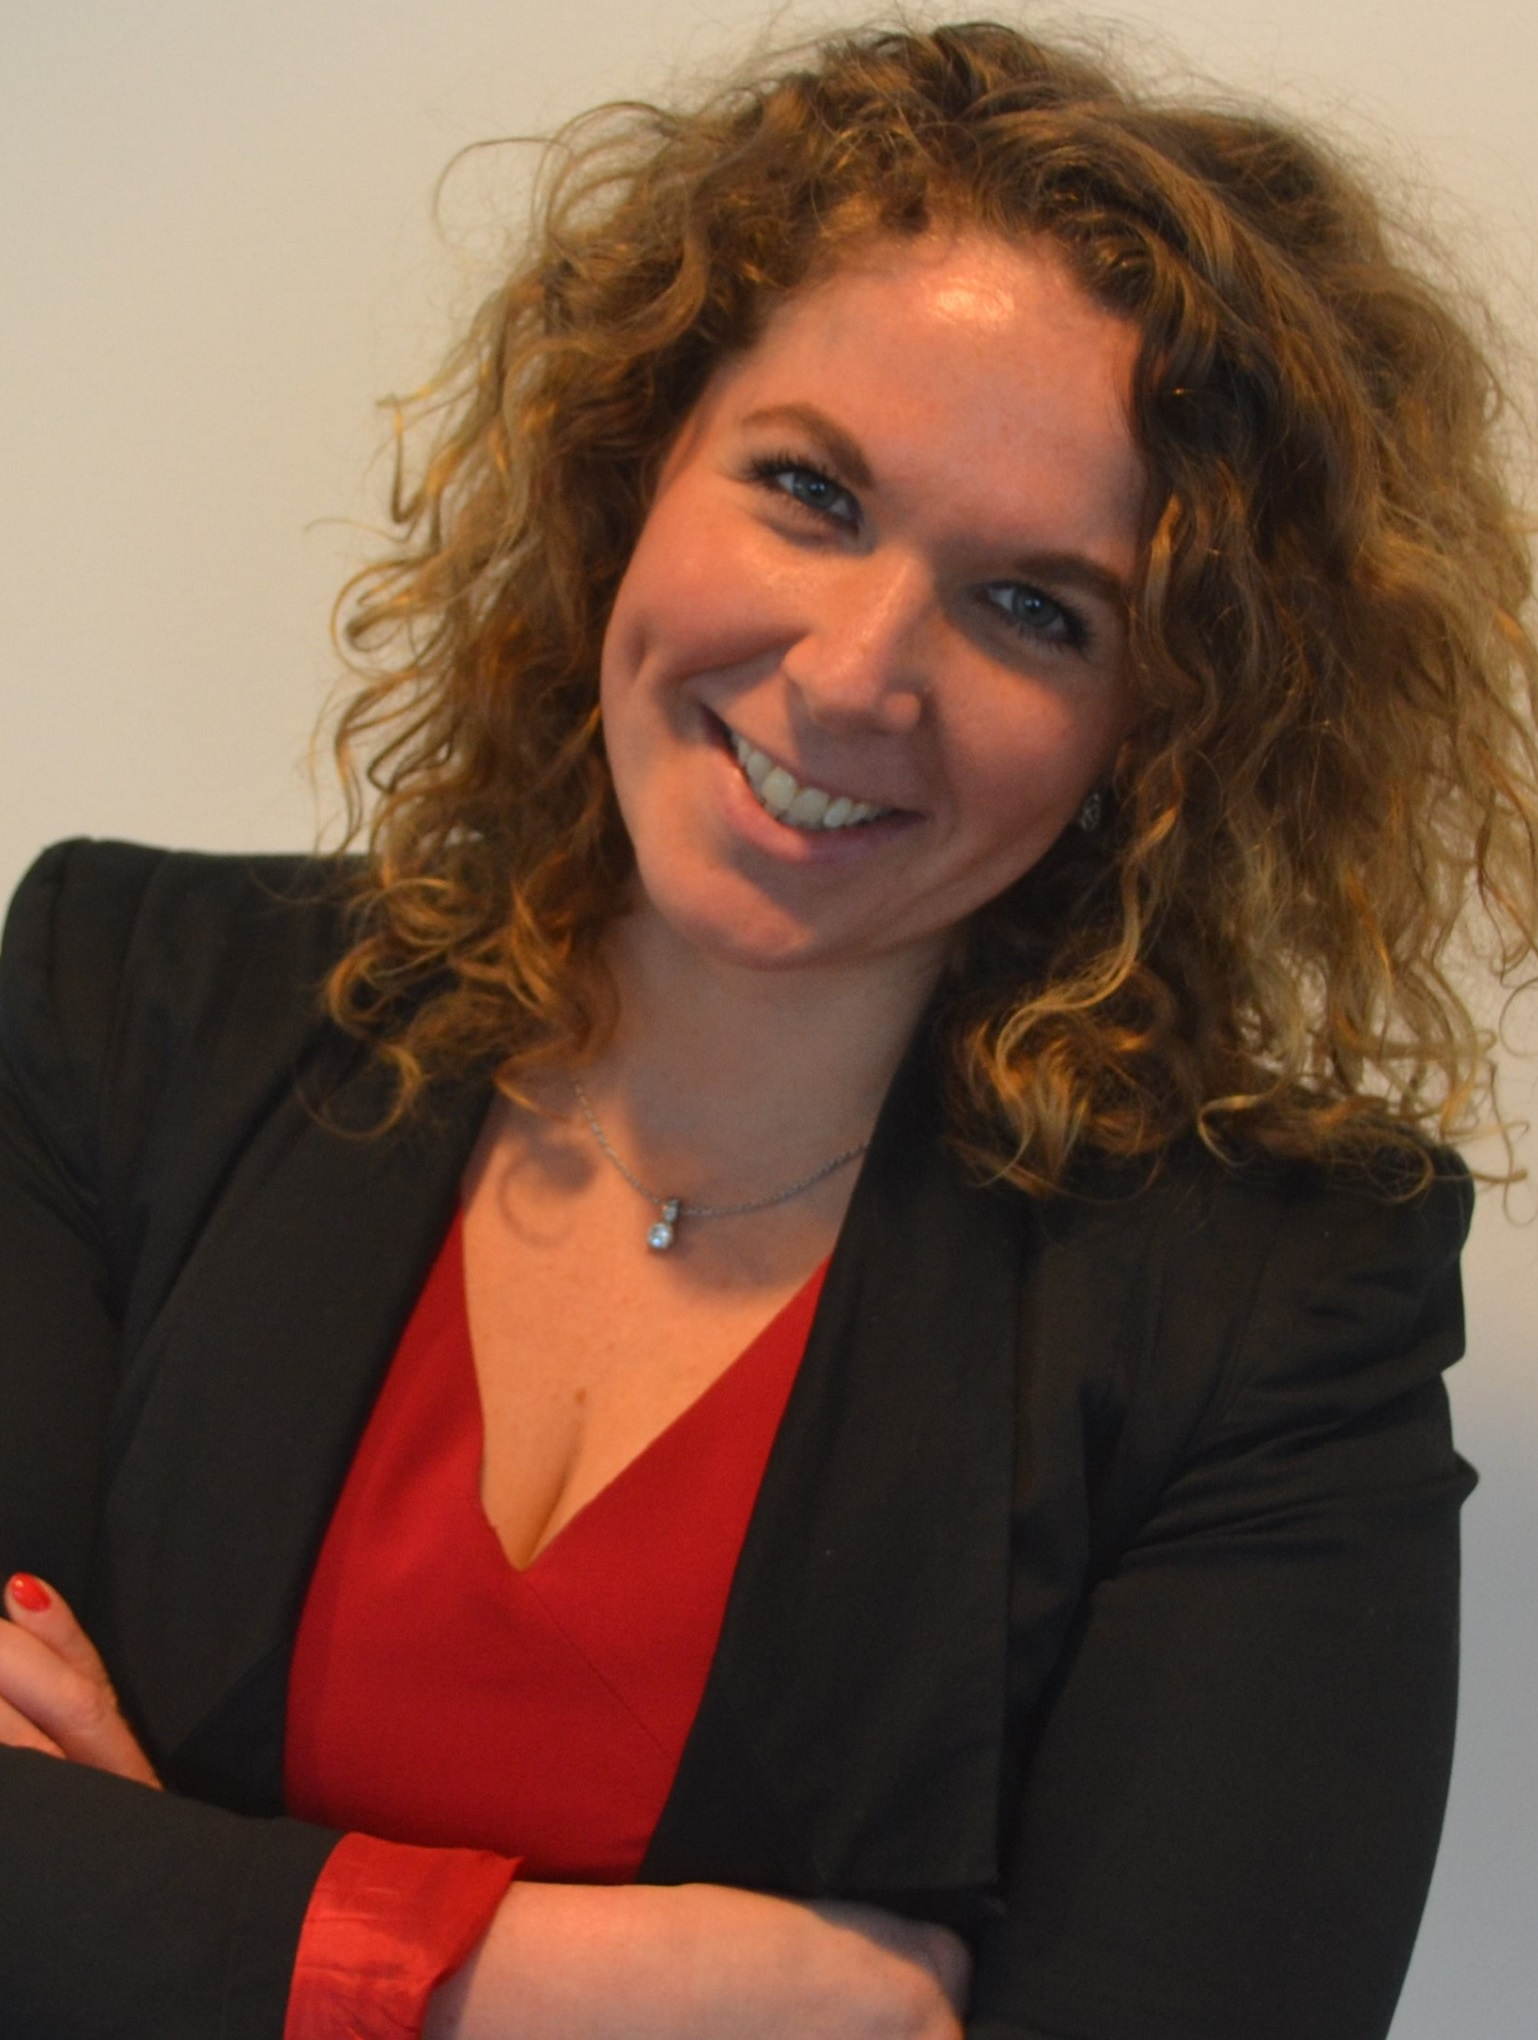 NL sportpsycholoog Simone v.d. Bijl - Amsterdam